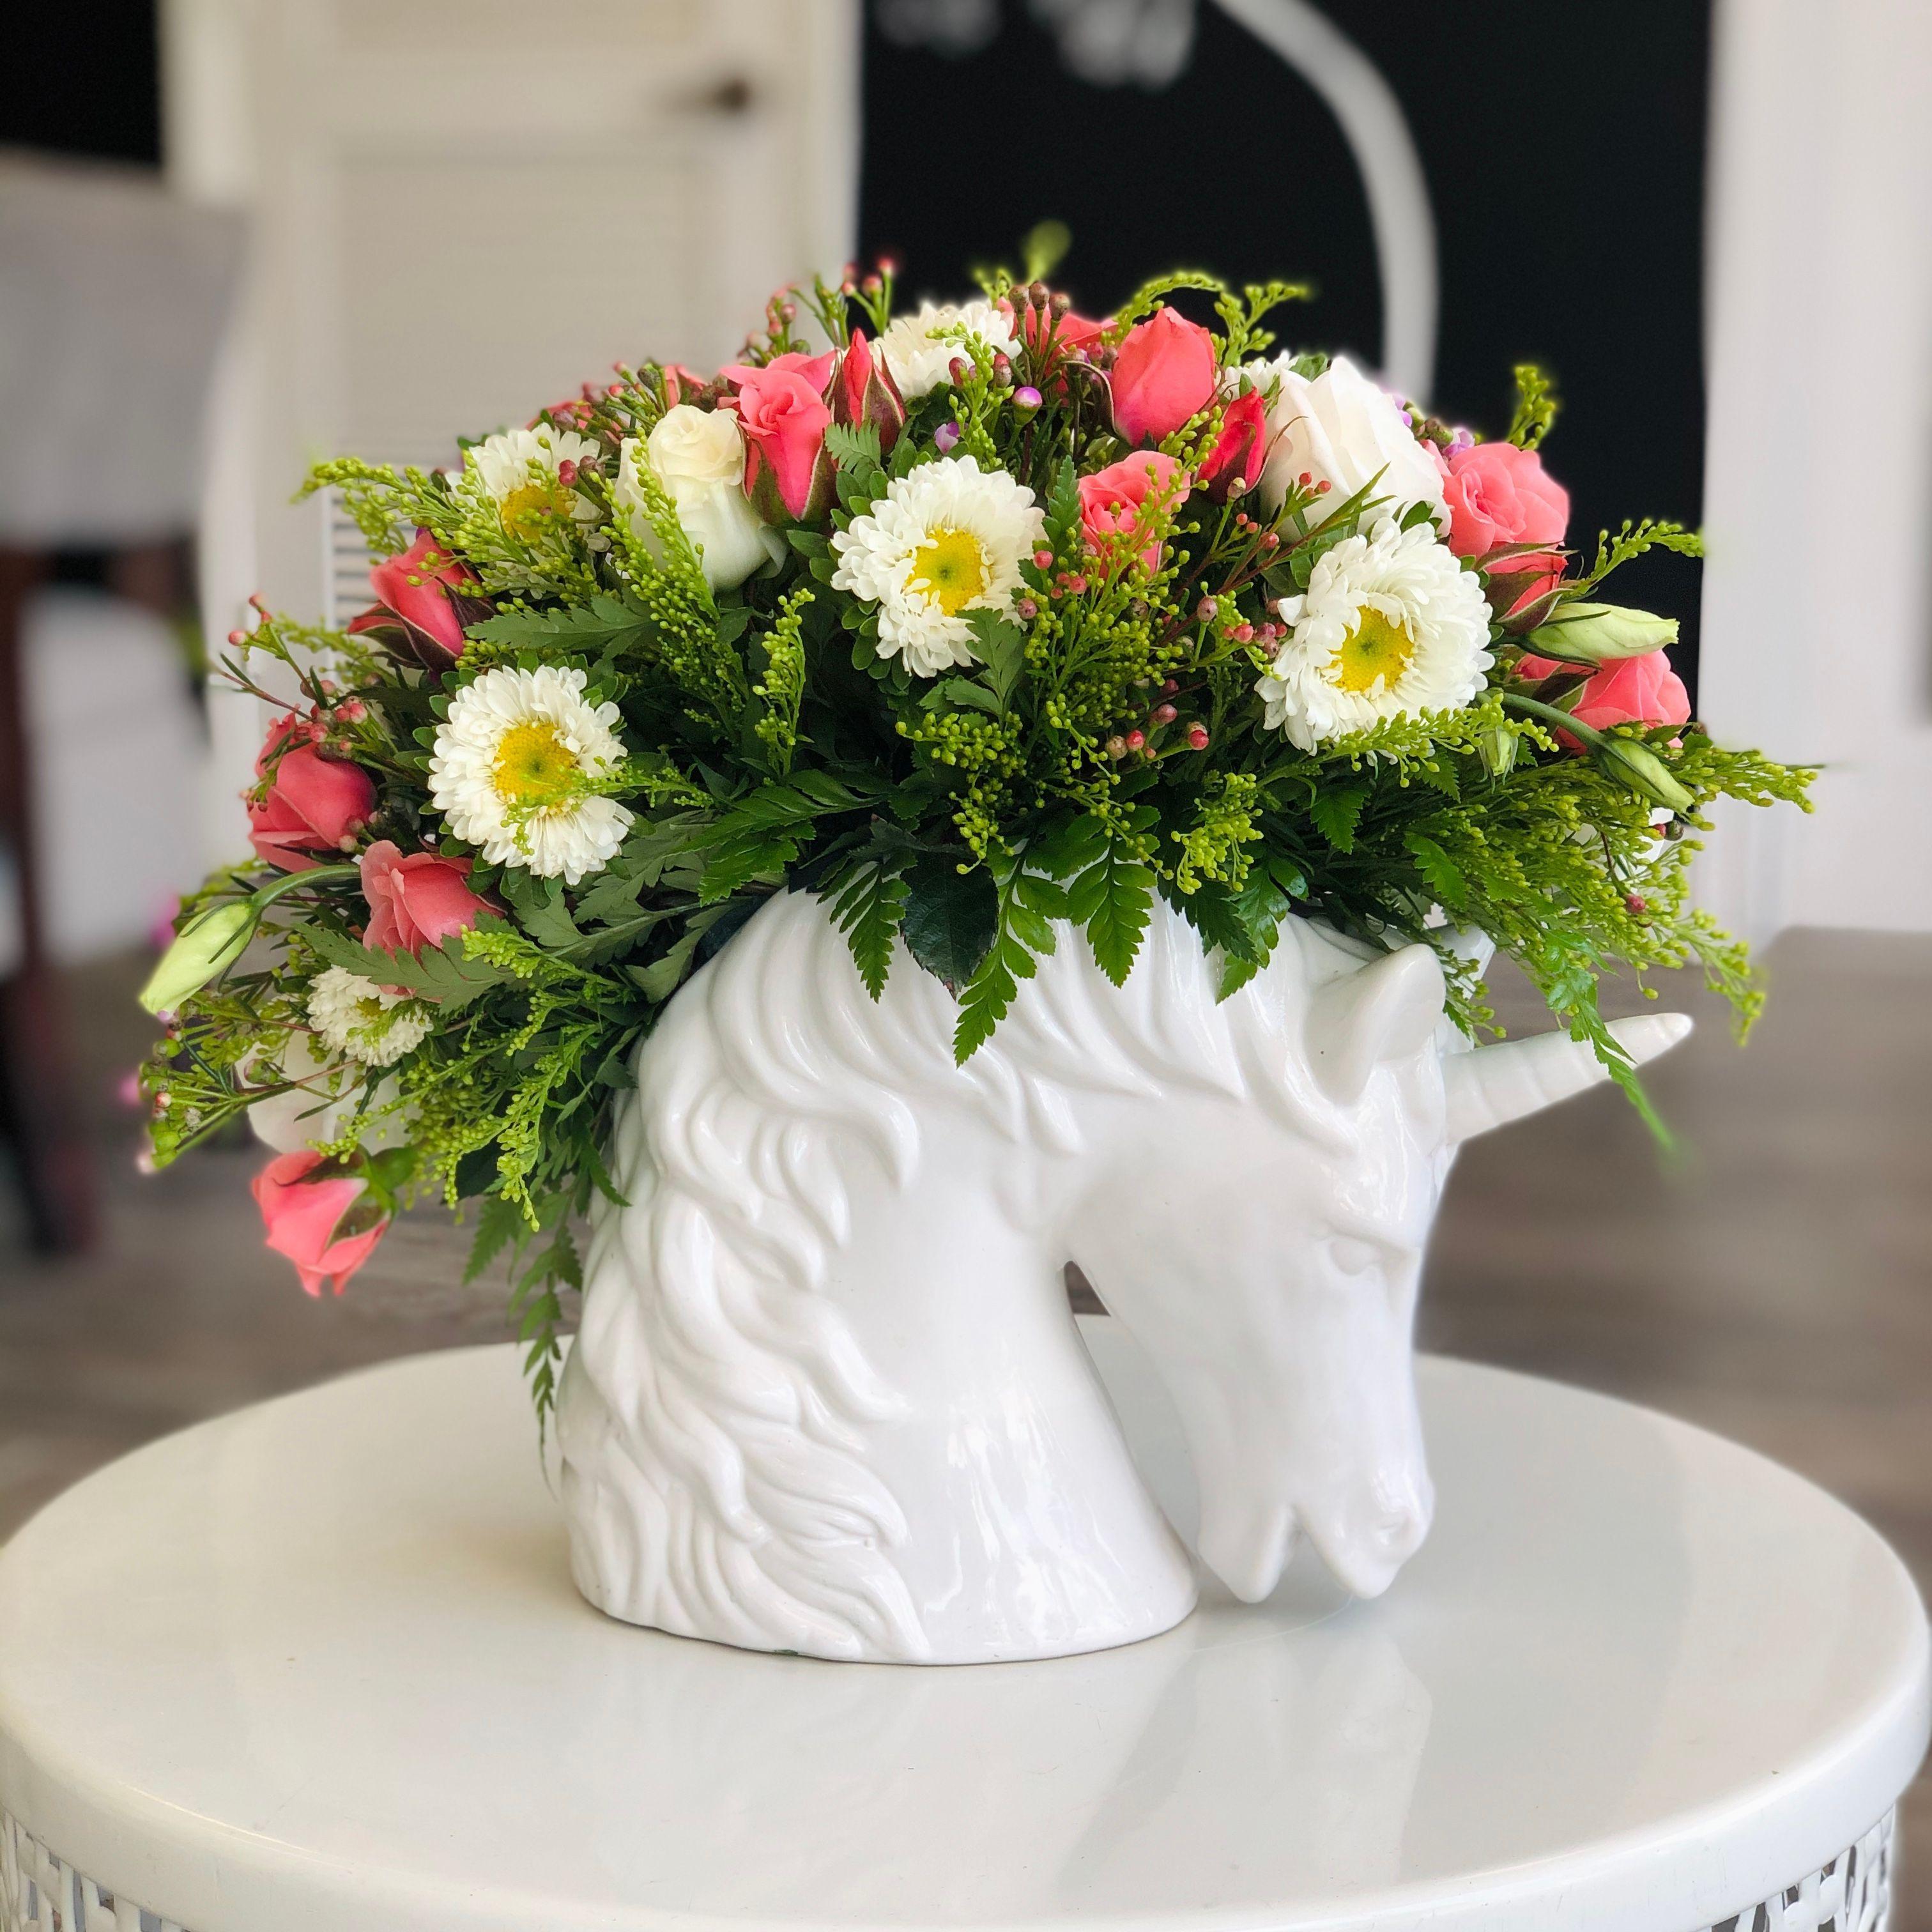 Majestic Unicorn Flower Shops Miami Fl Marie S Florals